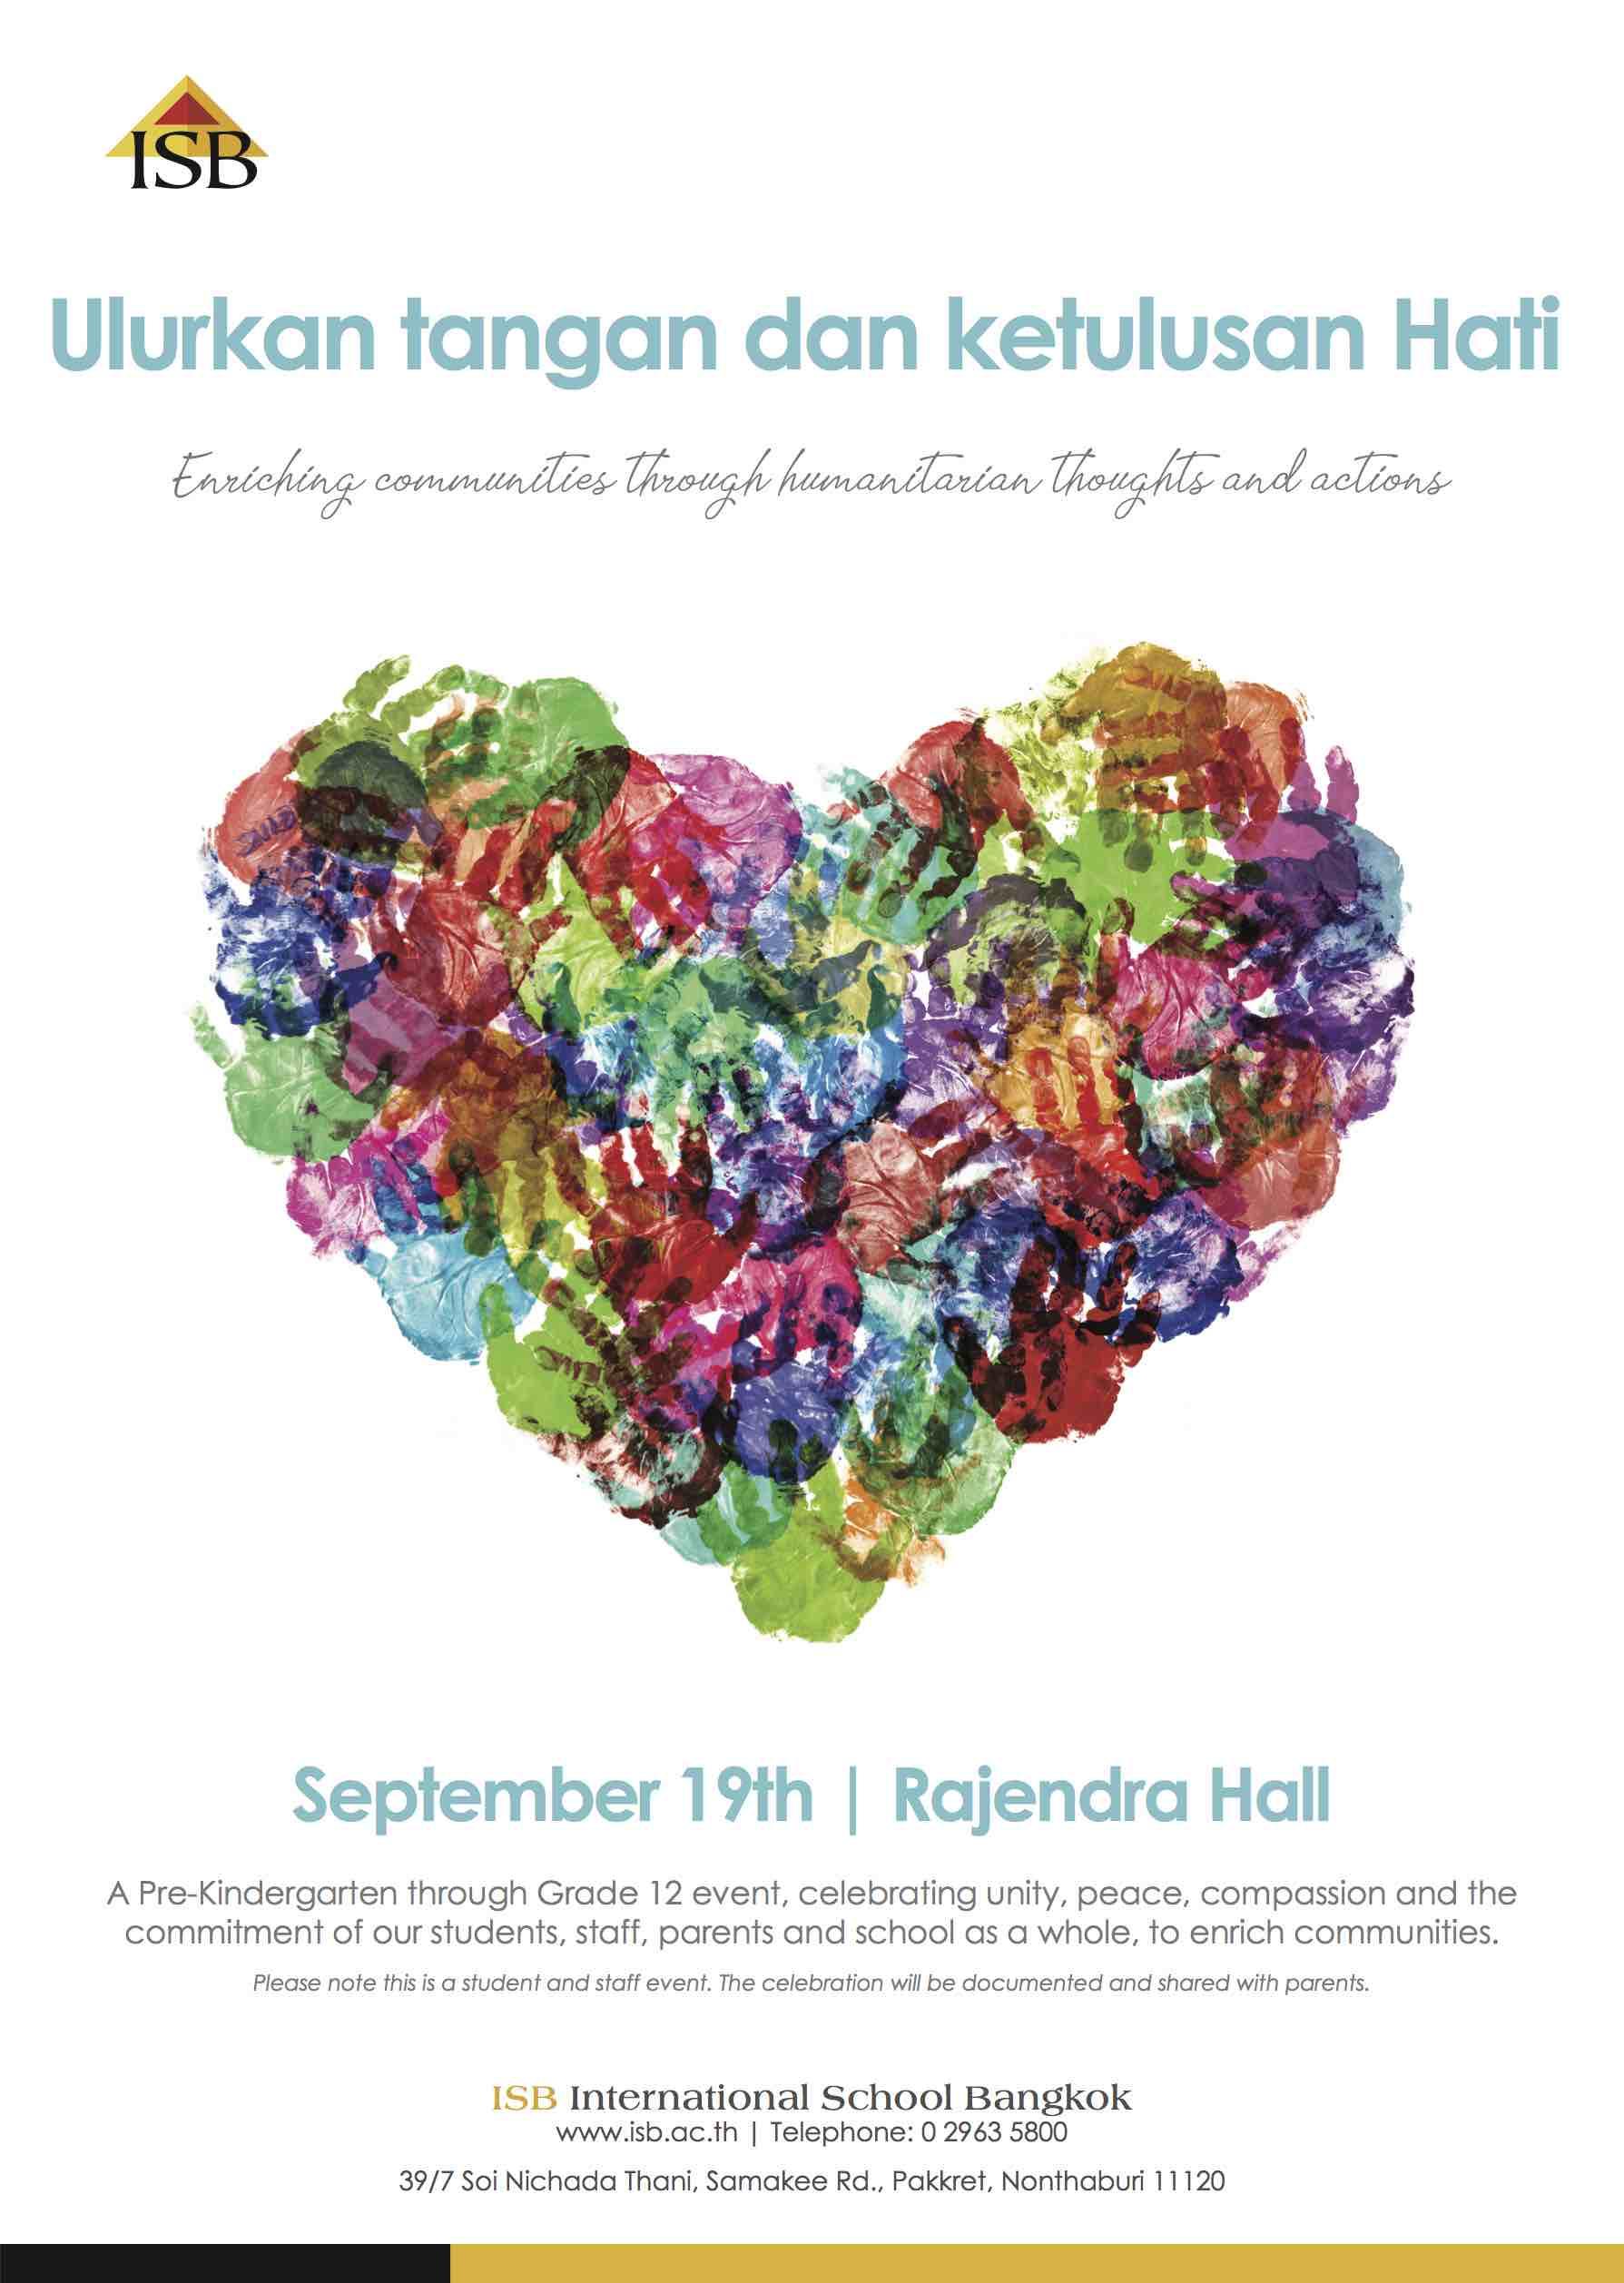 Enriching Communities7 Indonesian